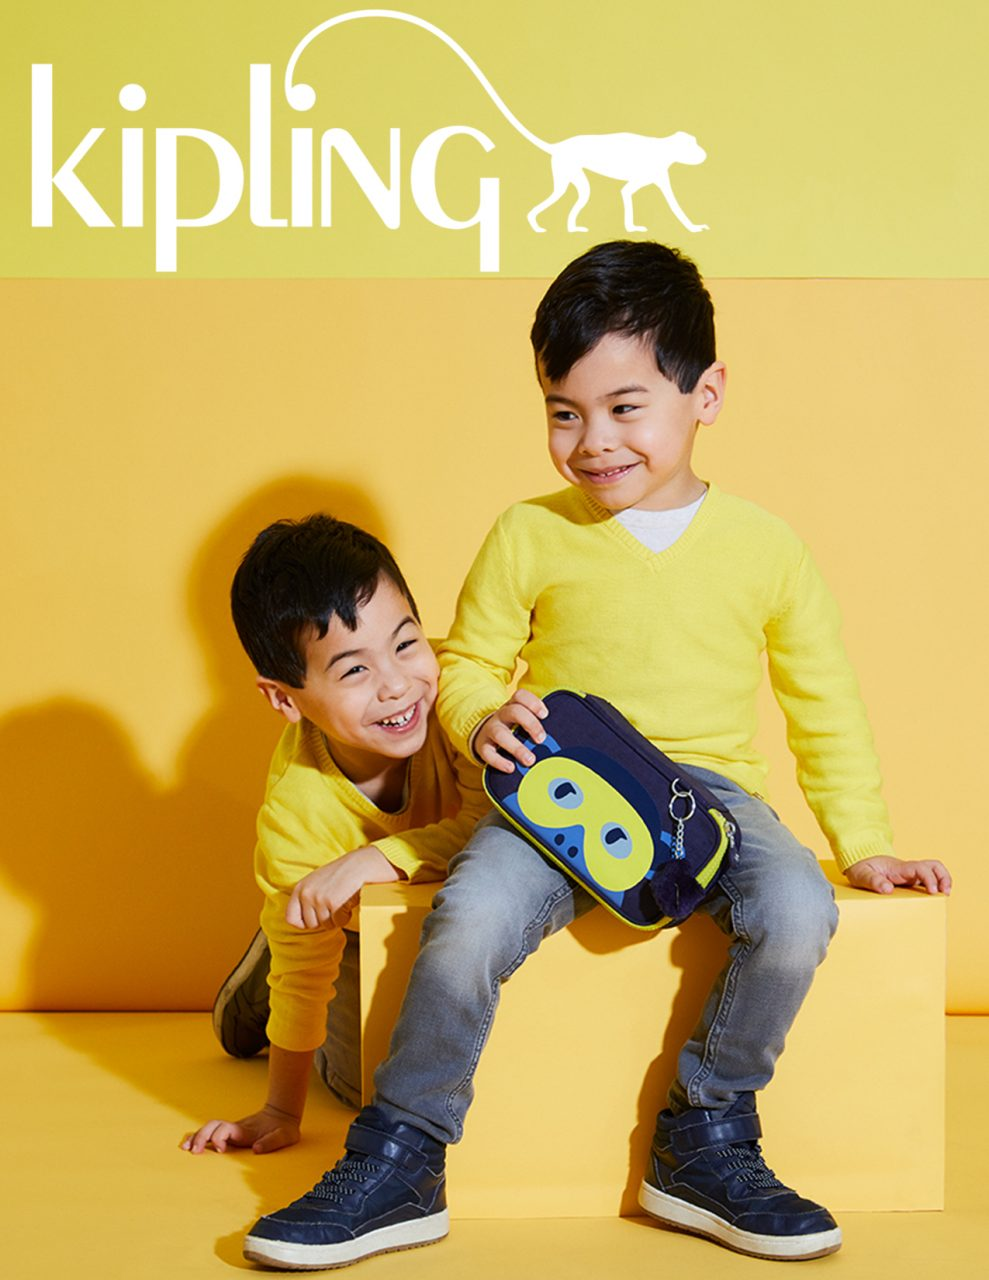 Kipling Final 4